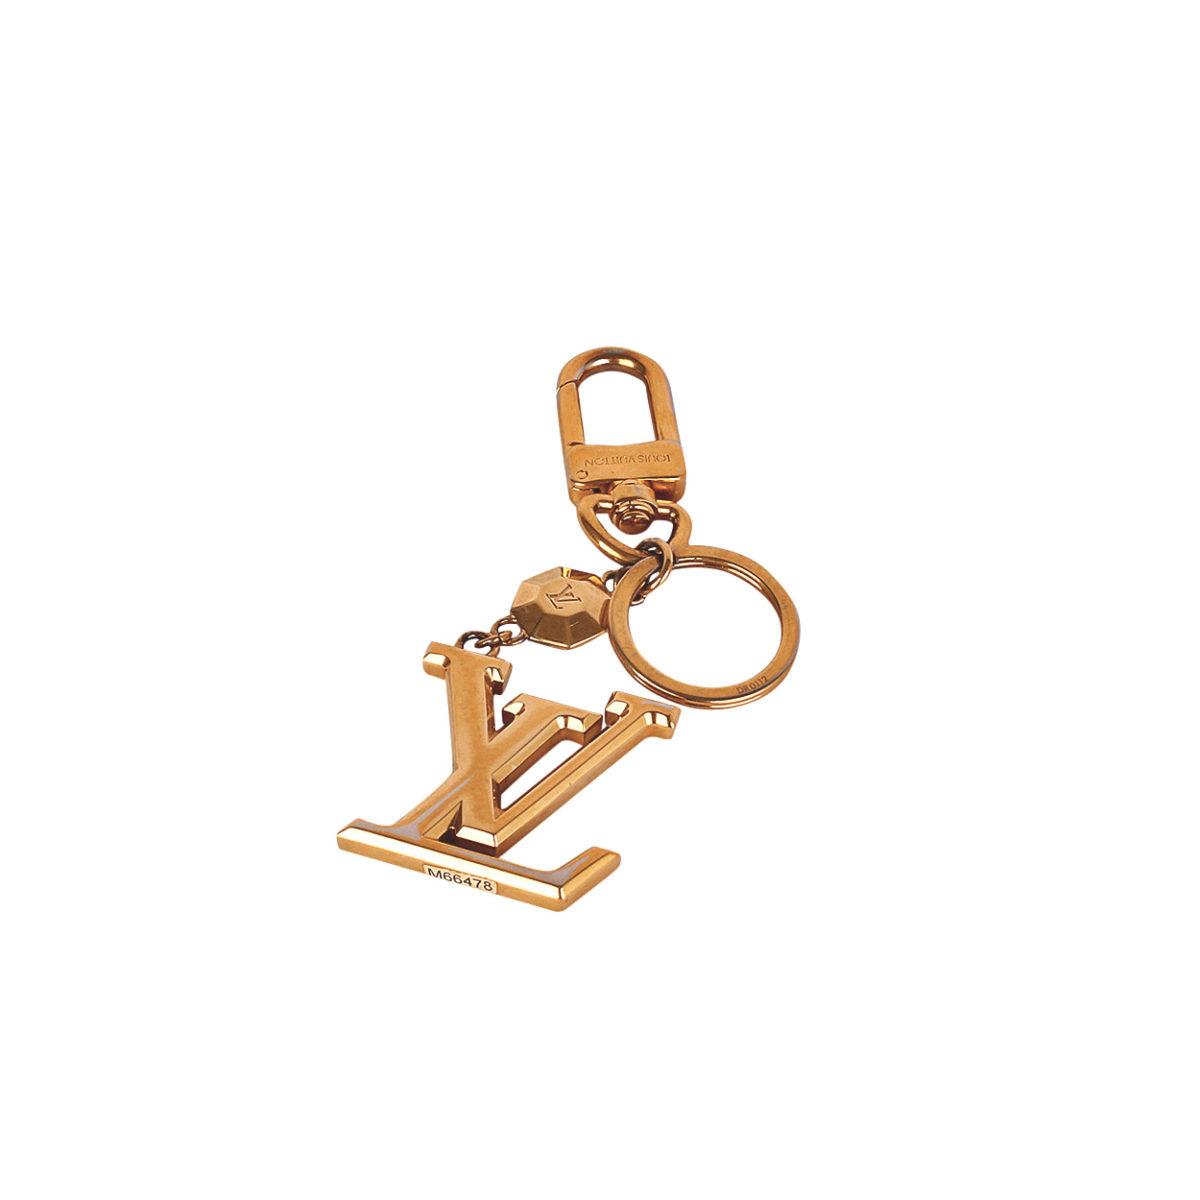 fedbbb32128 LOUIS VUITTON LV Facettes Bag Charm   Key Holder